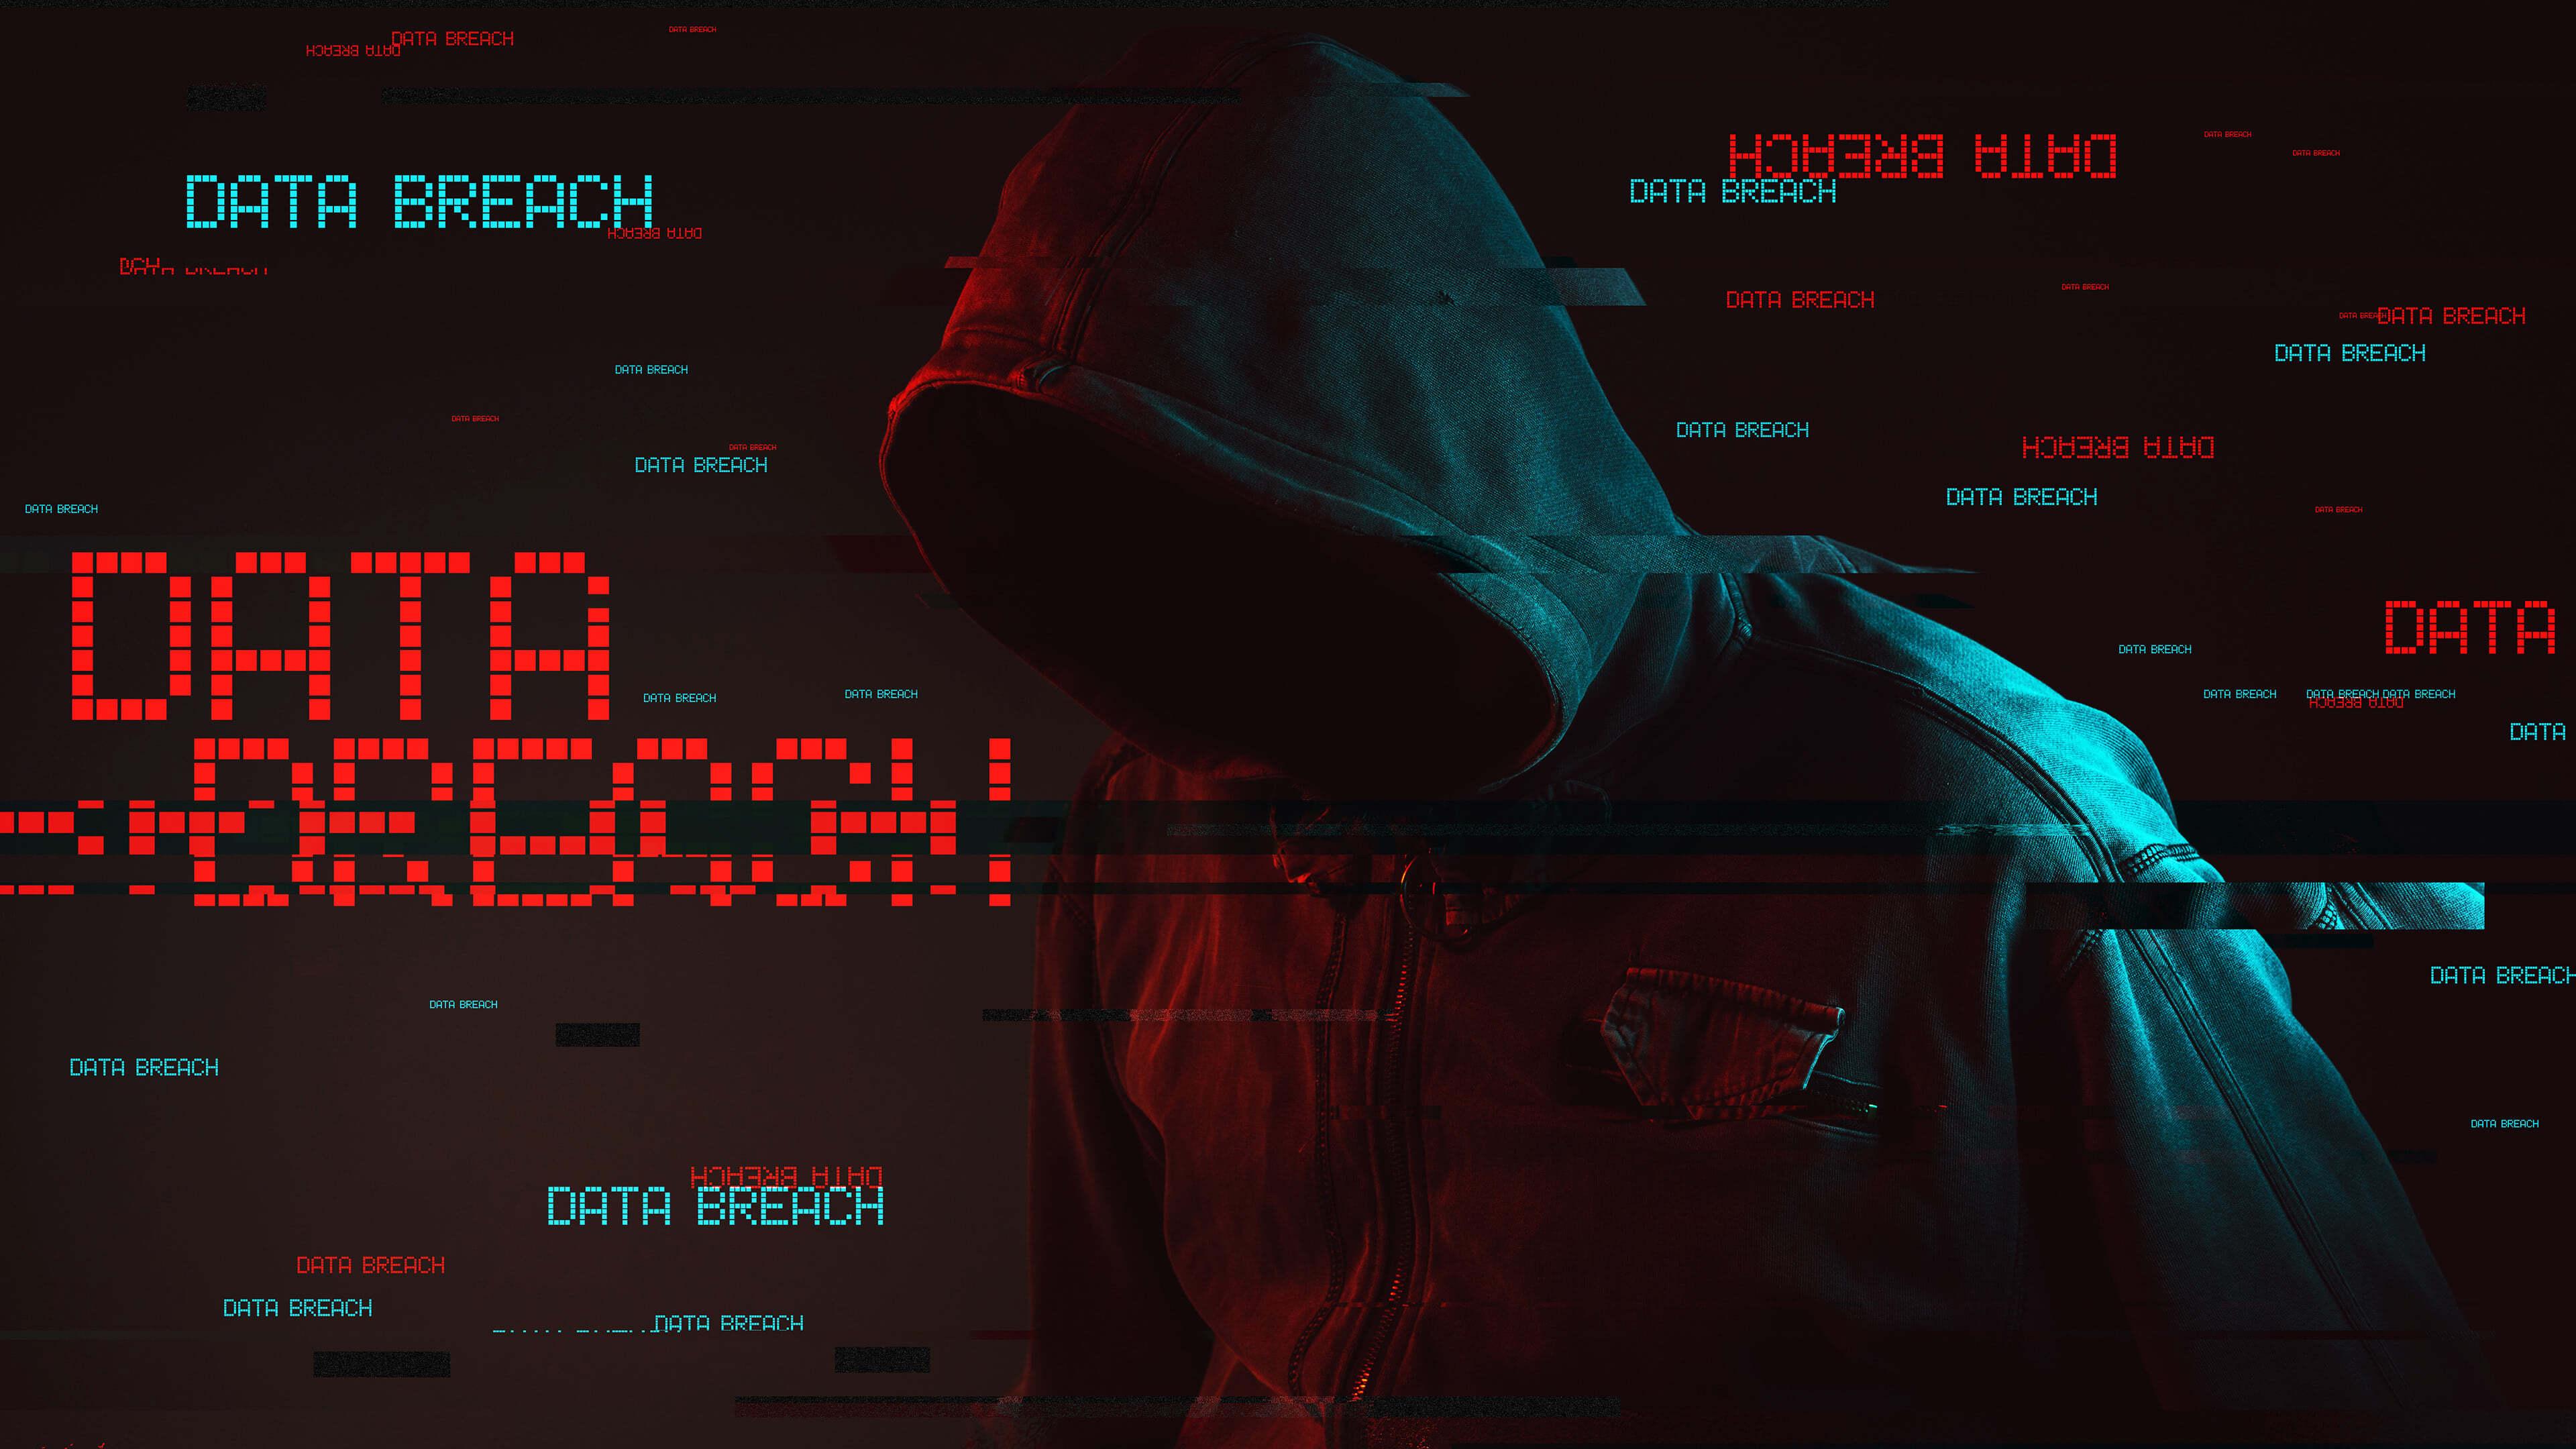 Hacker UHD 4K Wallpaper | Pixelz